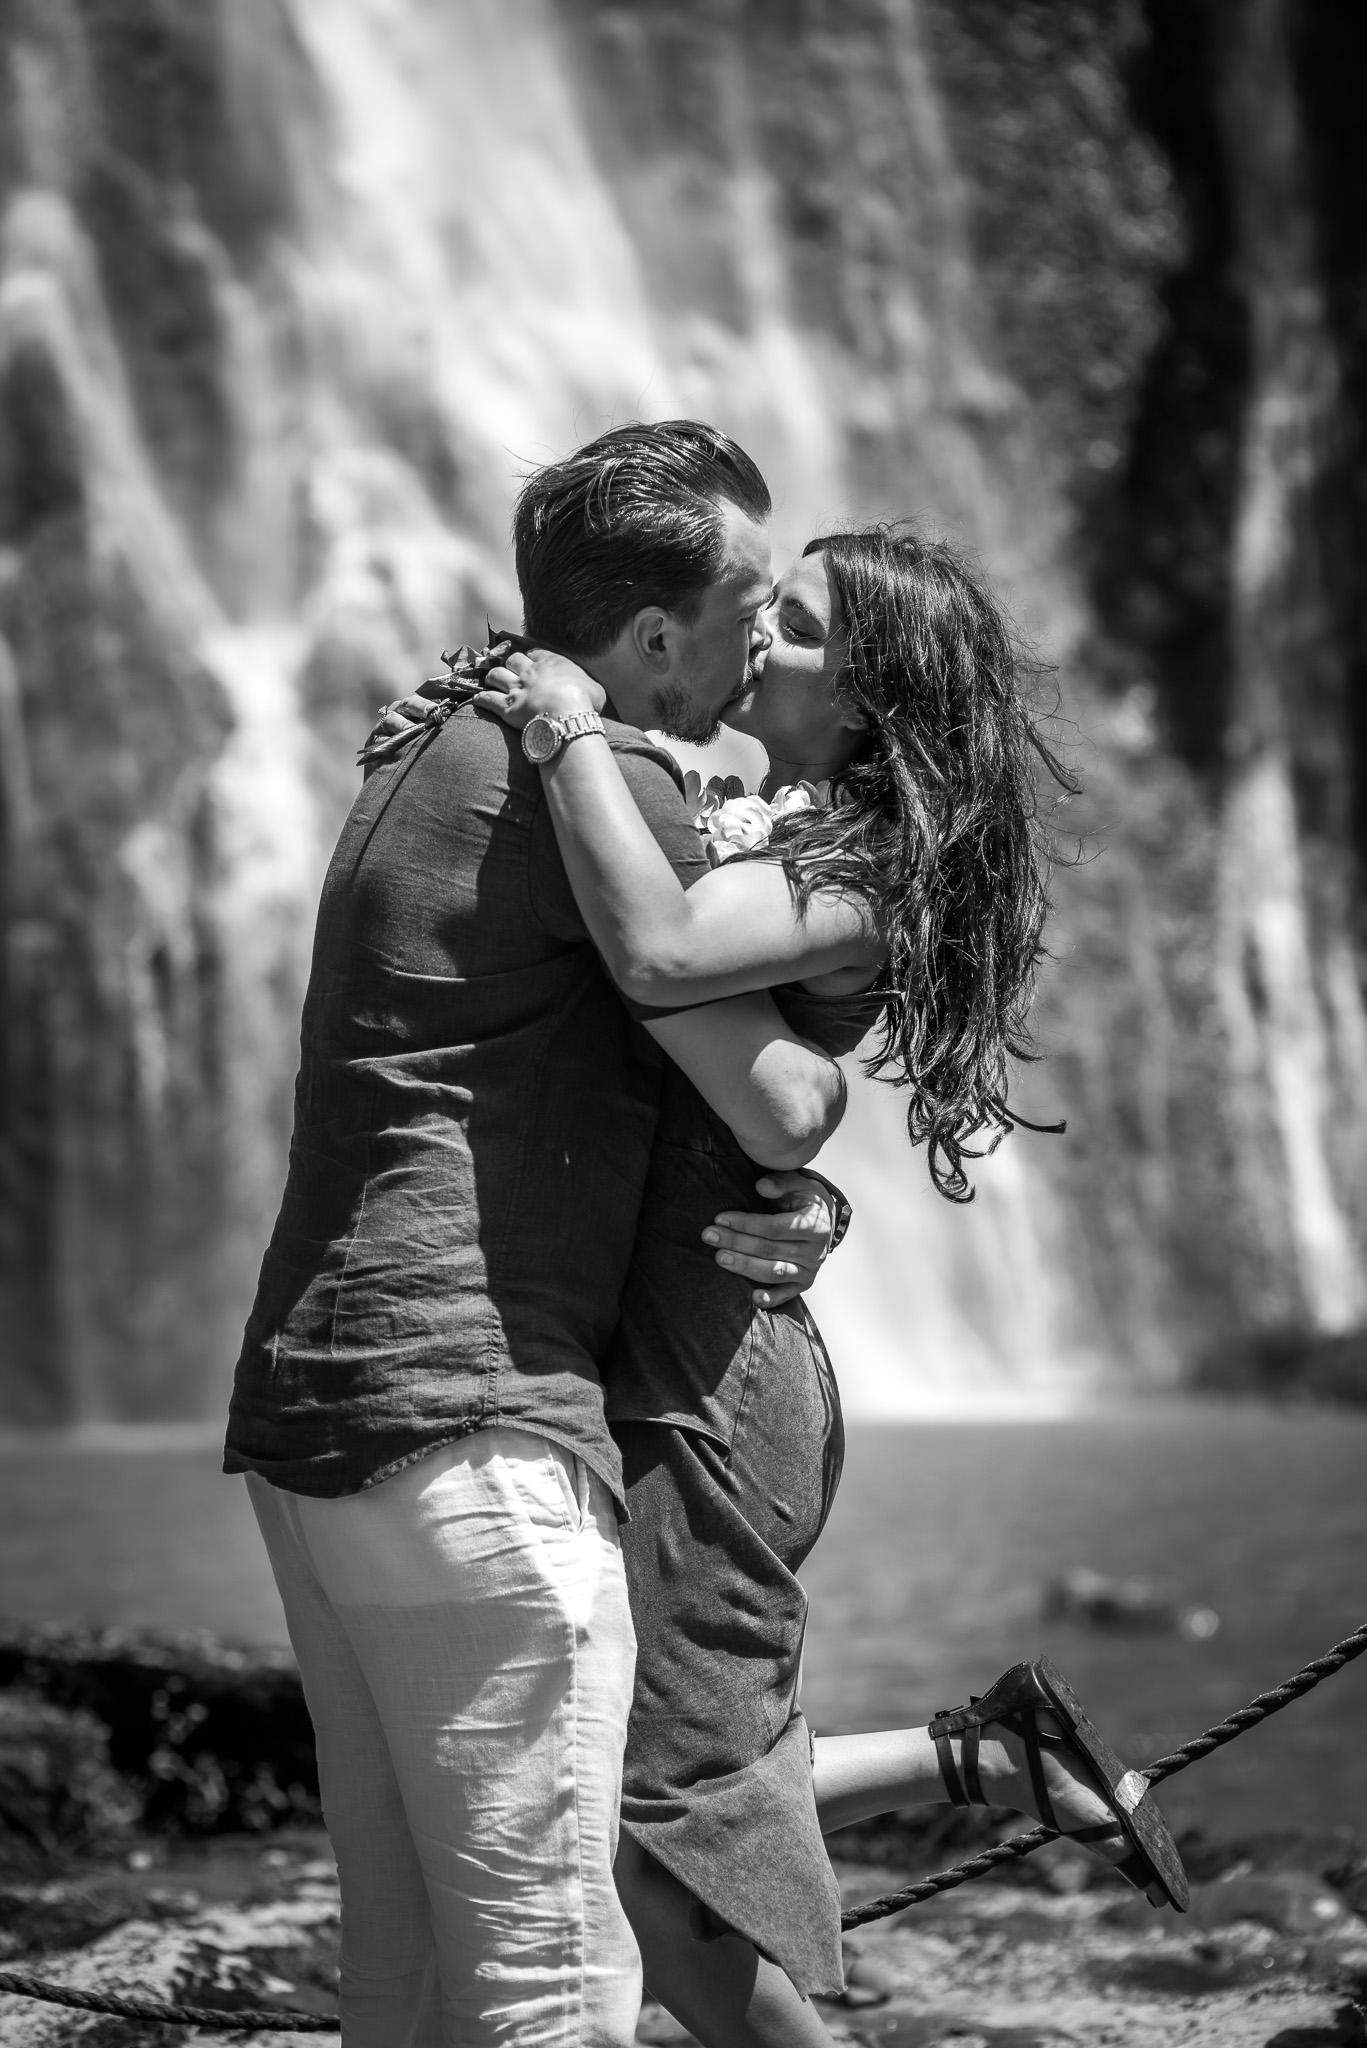 Black and White photo at kauai waterfalls